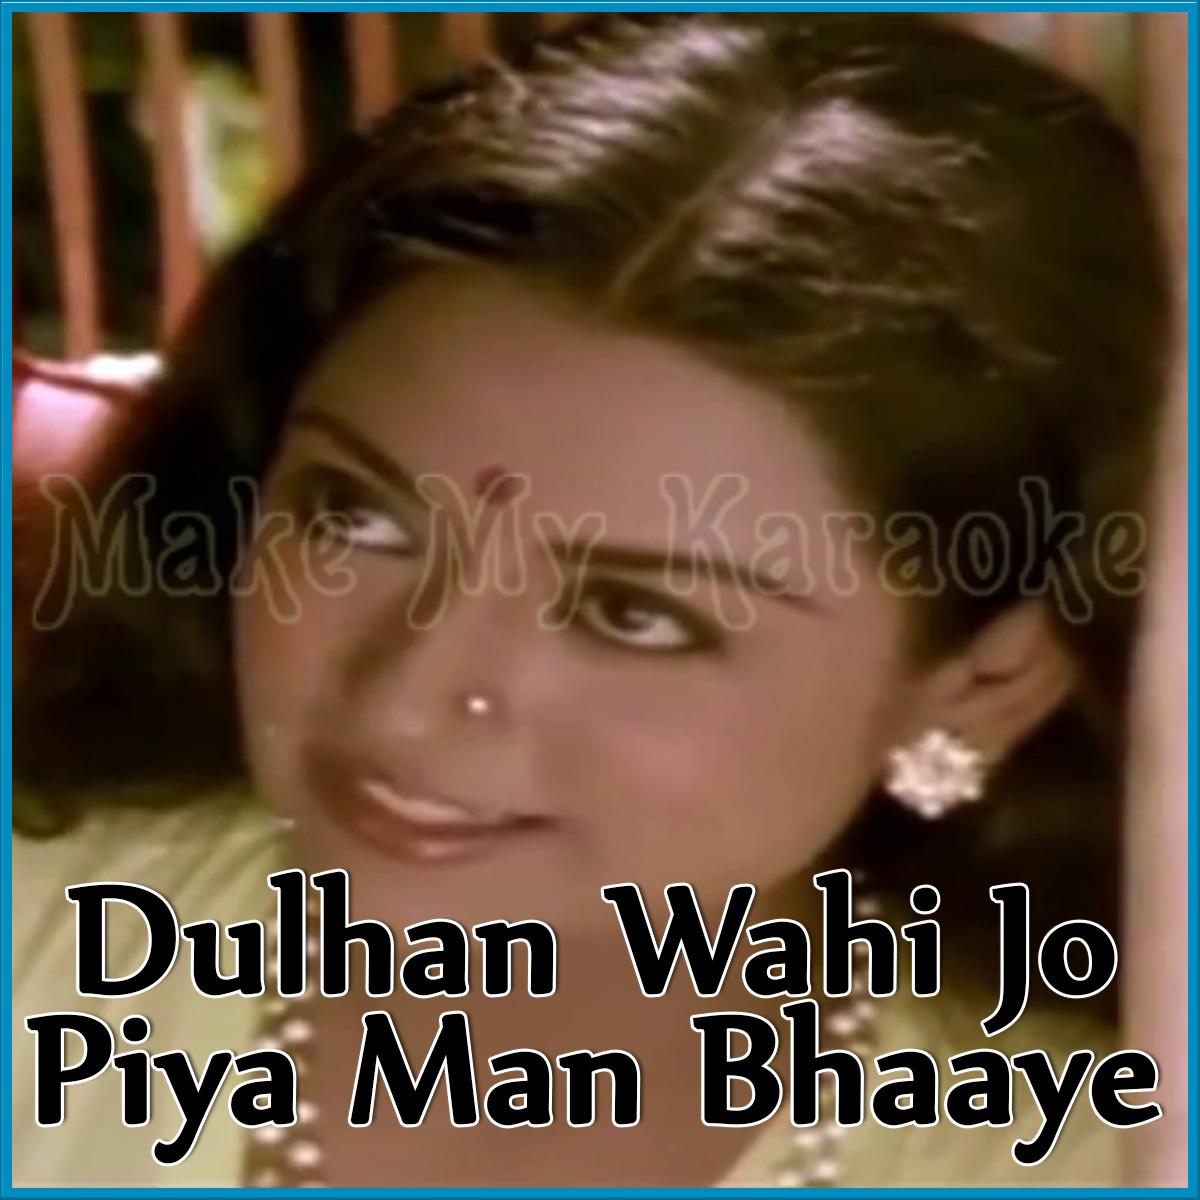 dulhan wahi jo piya man bhaye mp3 song